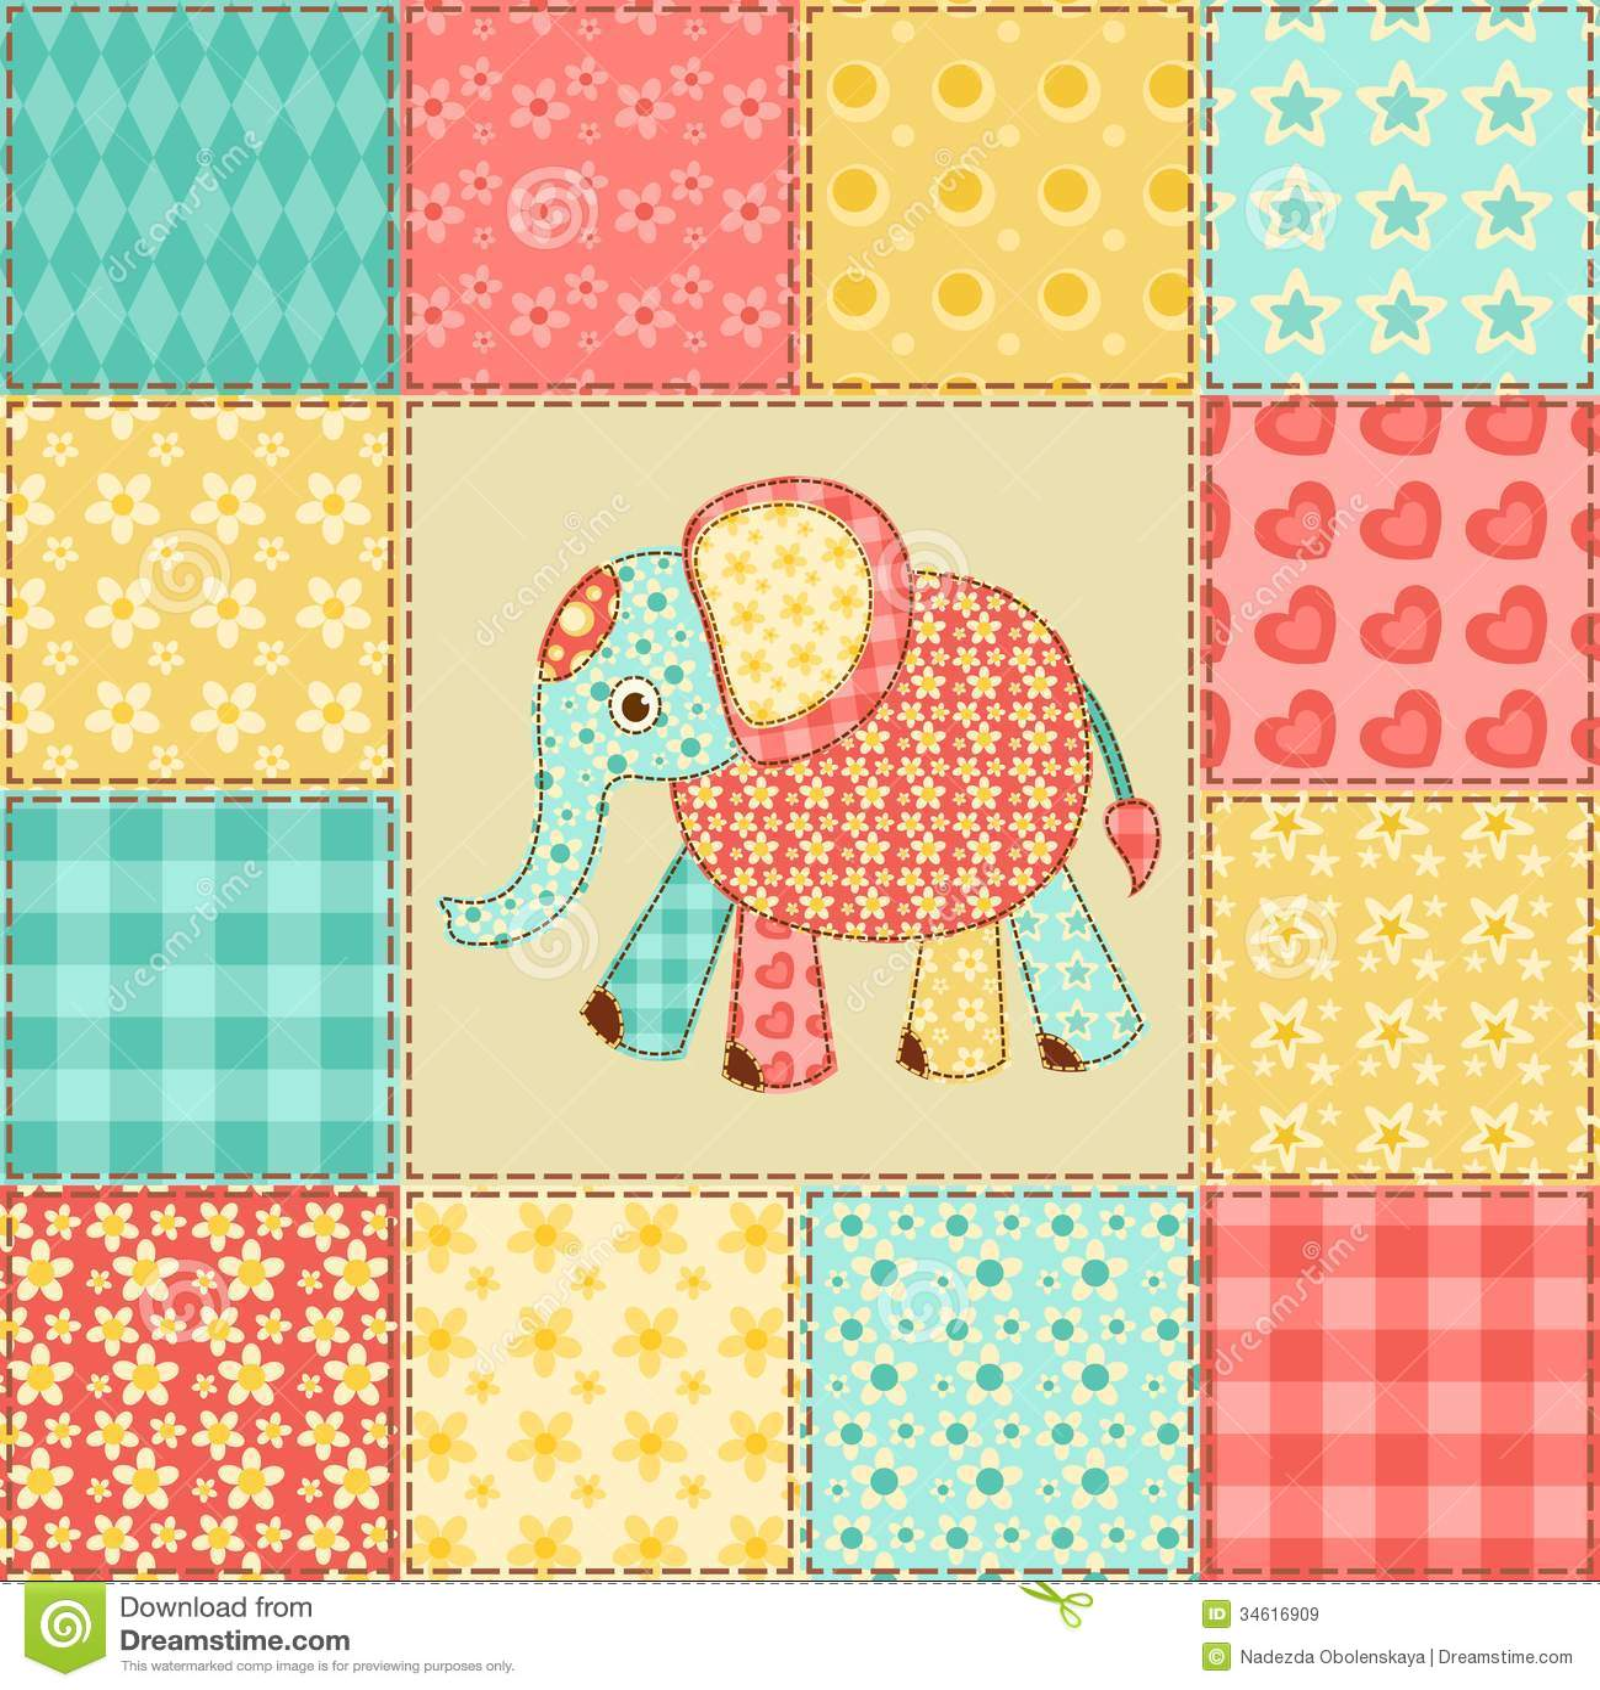 Elephant Patchwork Pattern Royalty Free Stock Images - Image: 34616909